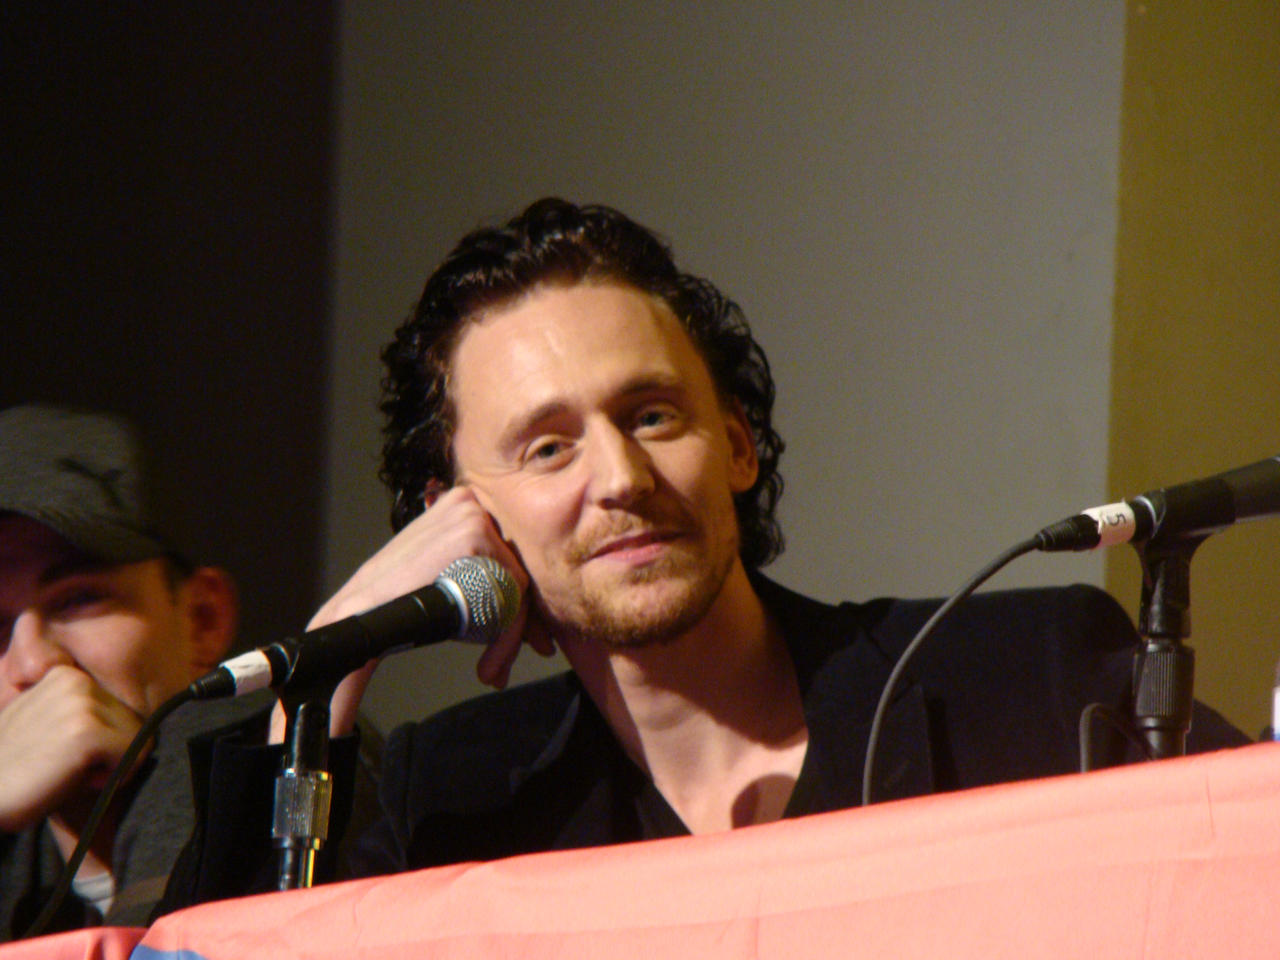 Tom Hiddleston by galidor